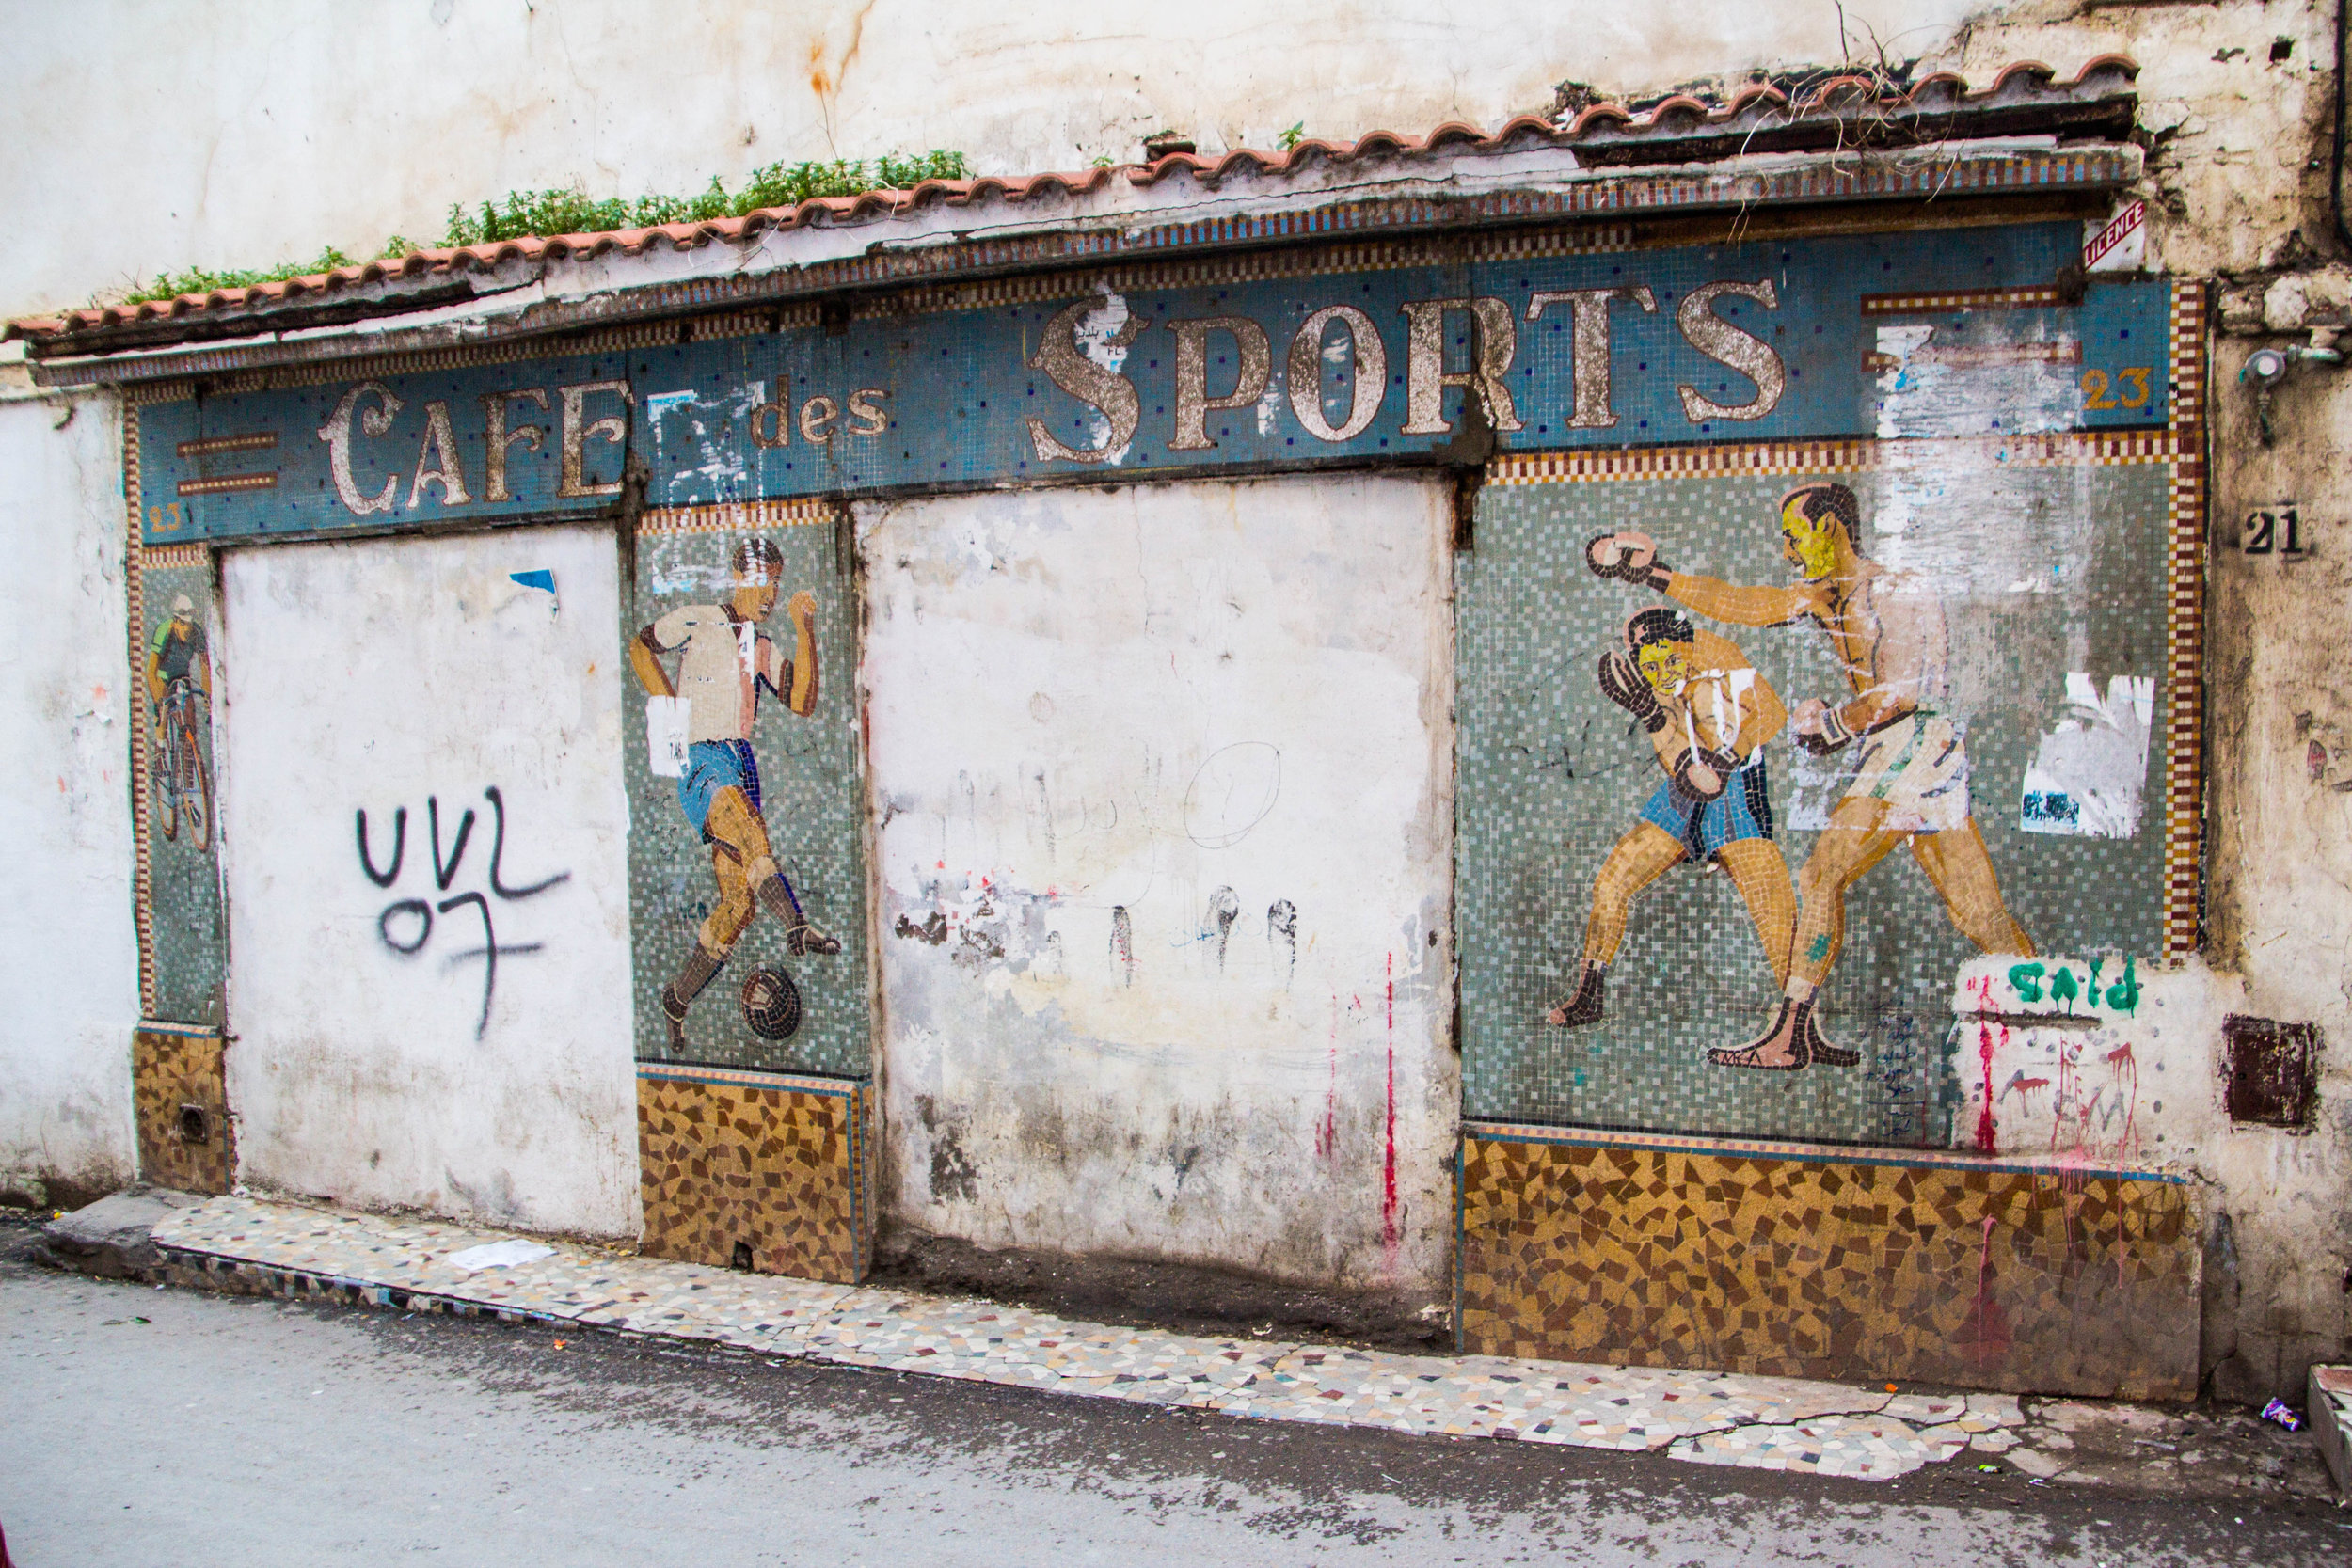 streets-algiers-algeria-44.jpg